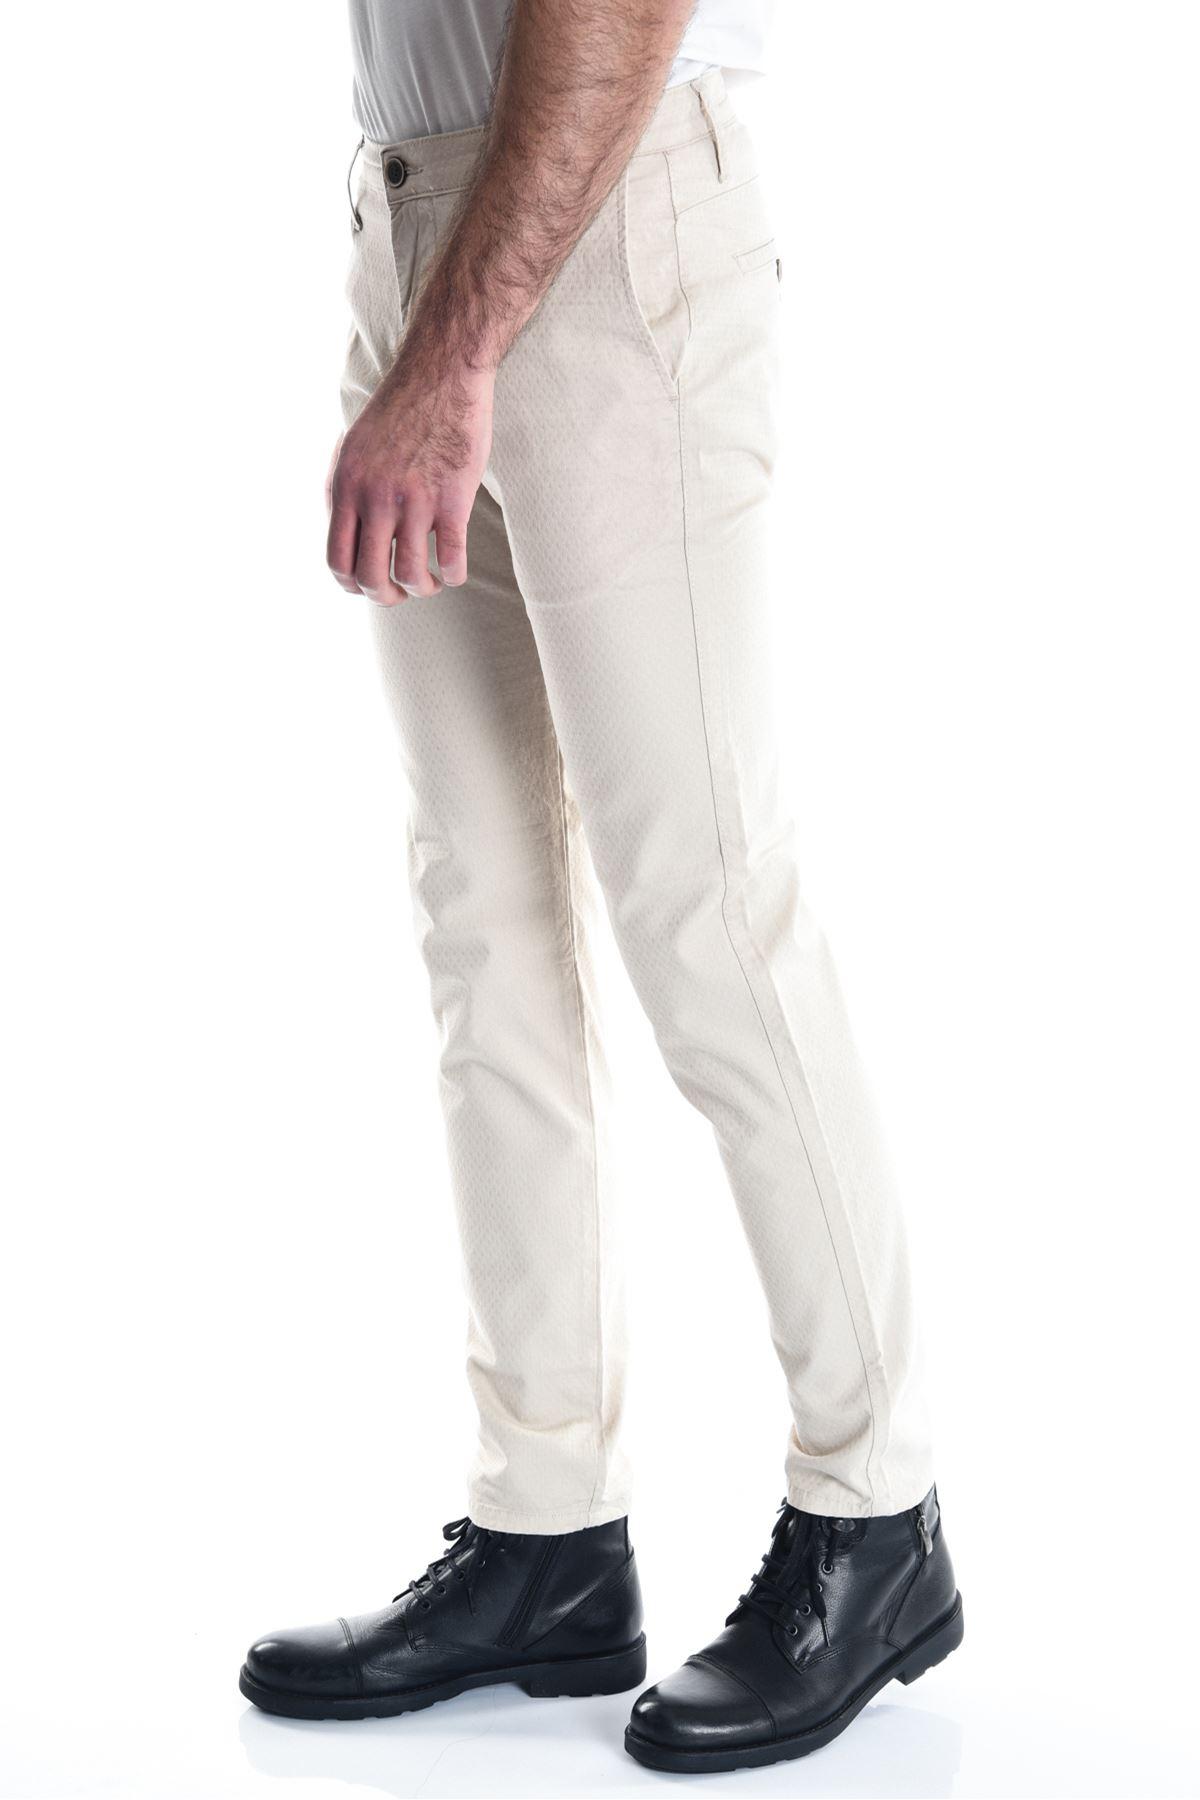 Taş Slimfit Erkek Chino Pantolon